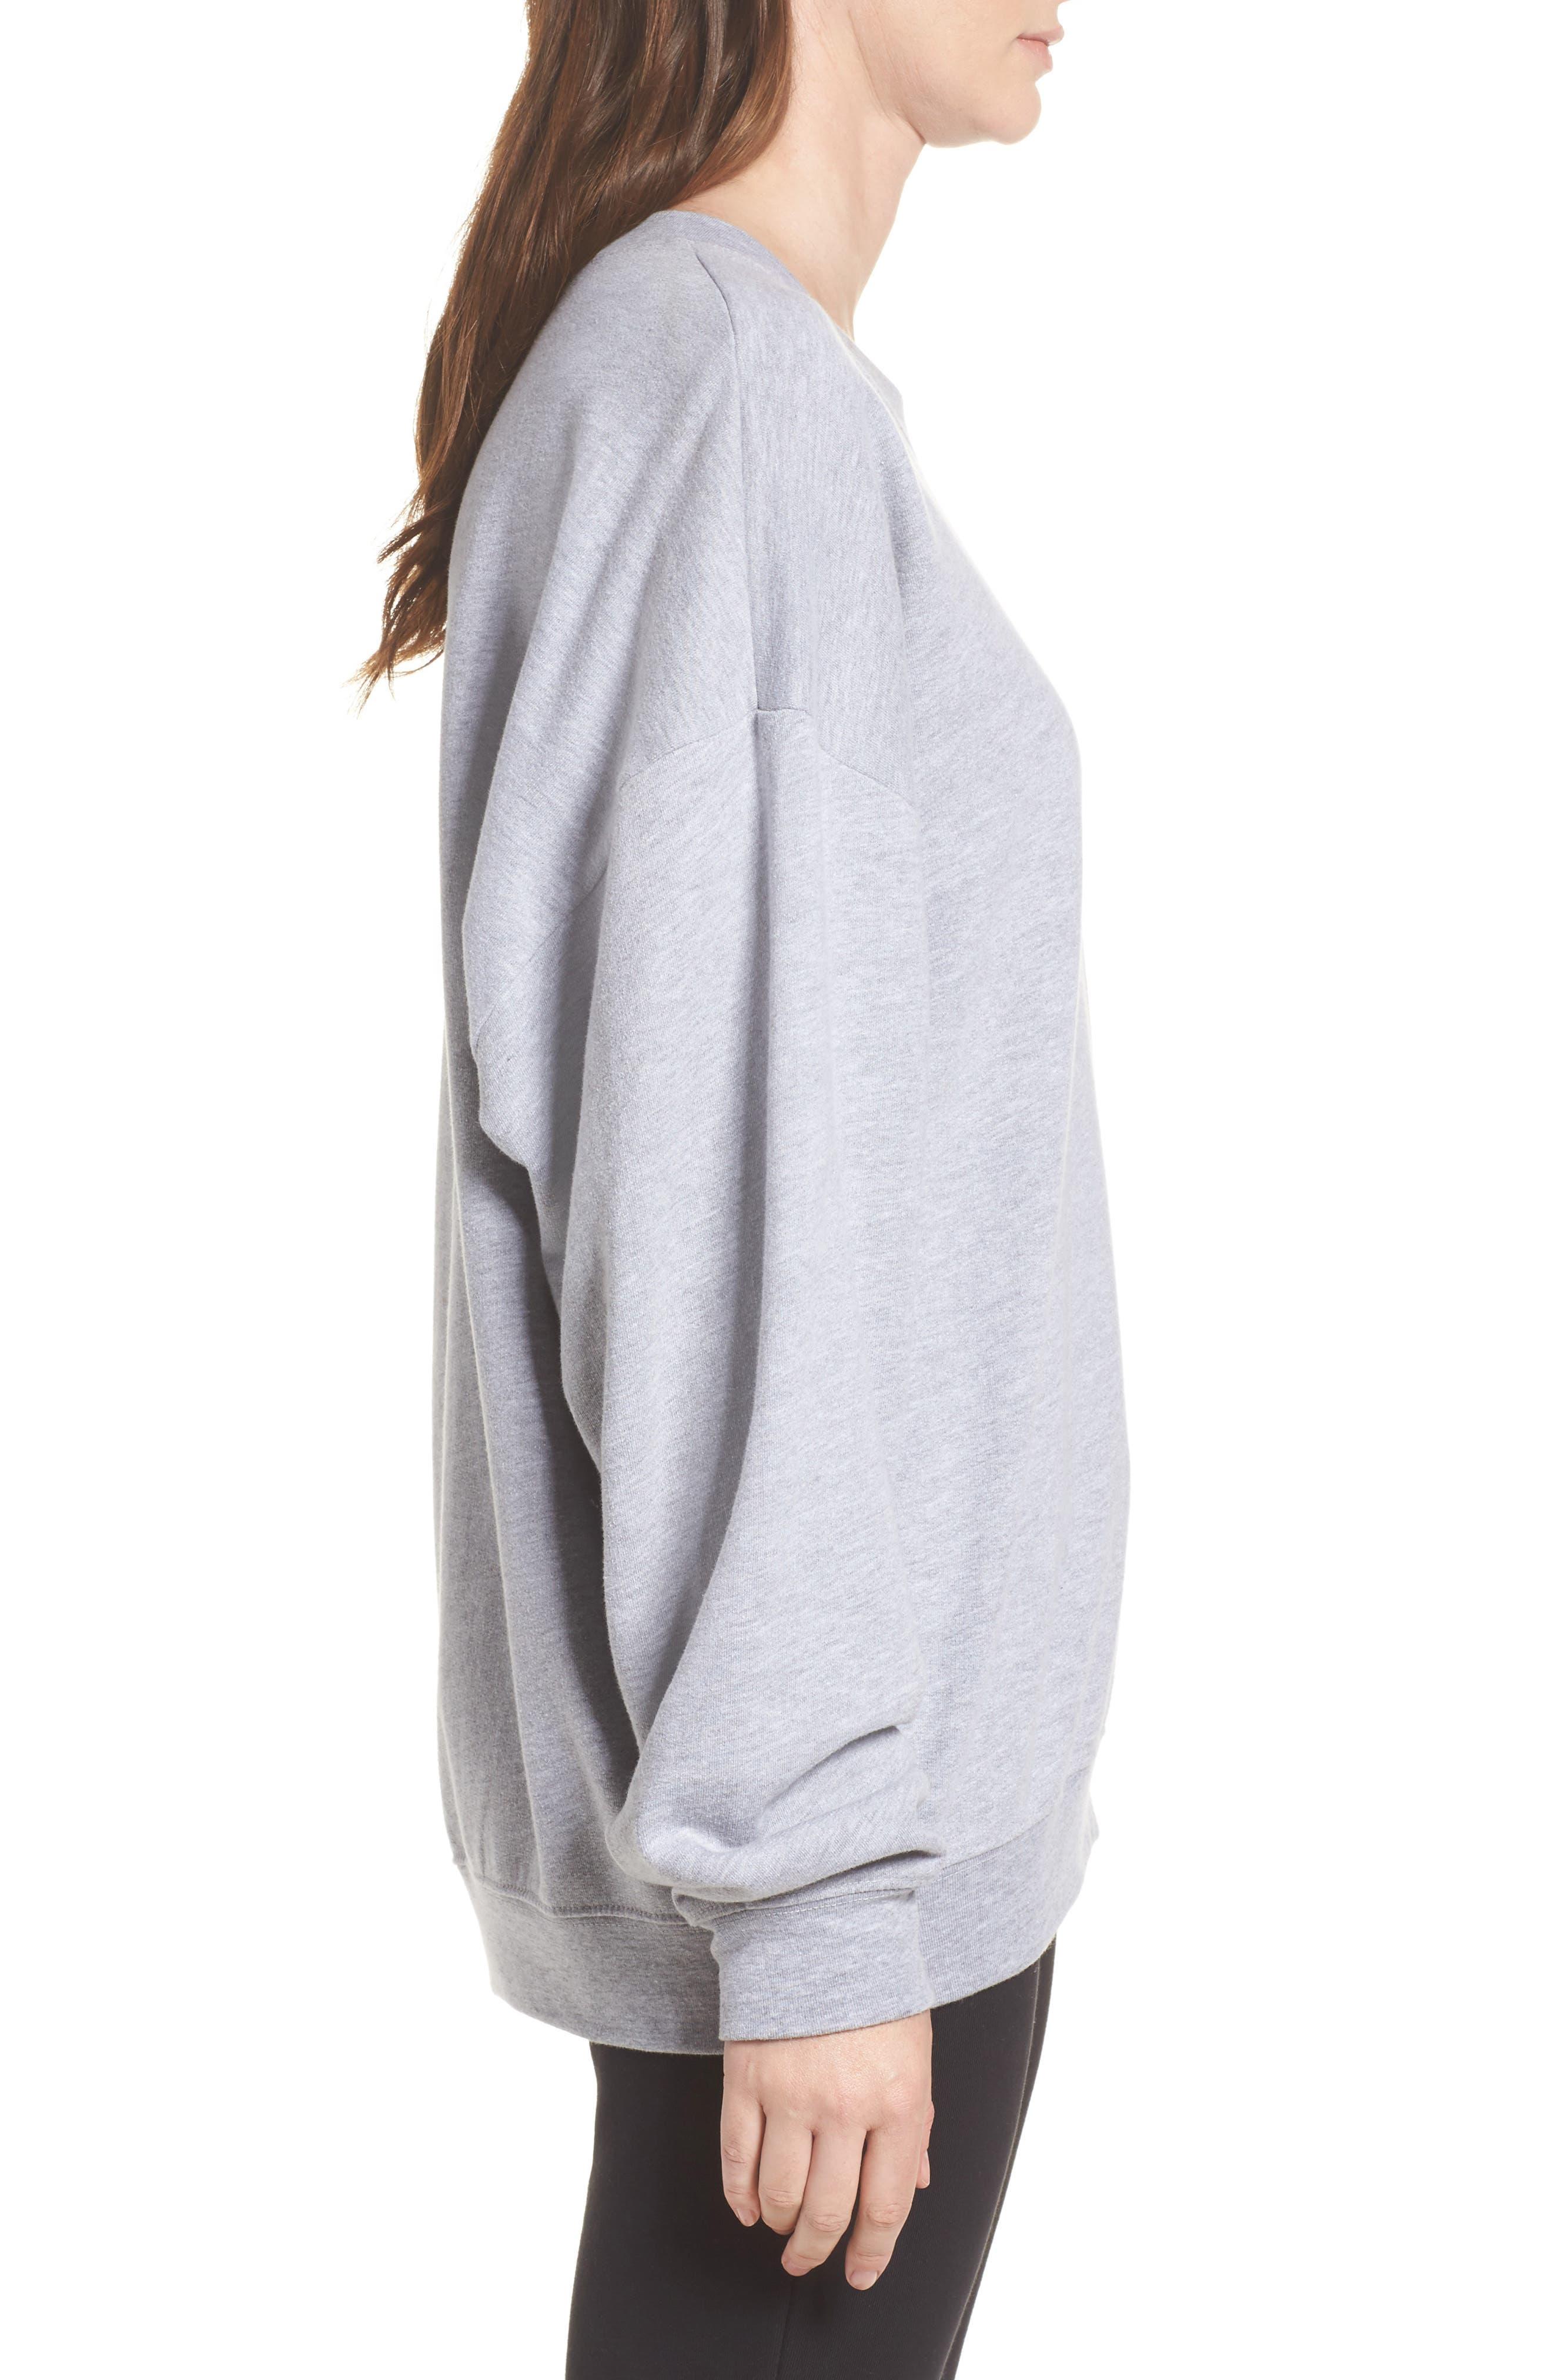 Ellstan Oversize Boyfriend Sweatshirt,                             Alternate thumbnail 3, color,                             035